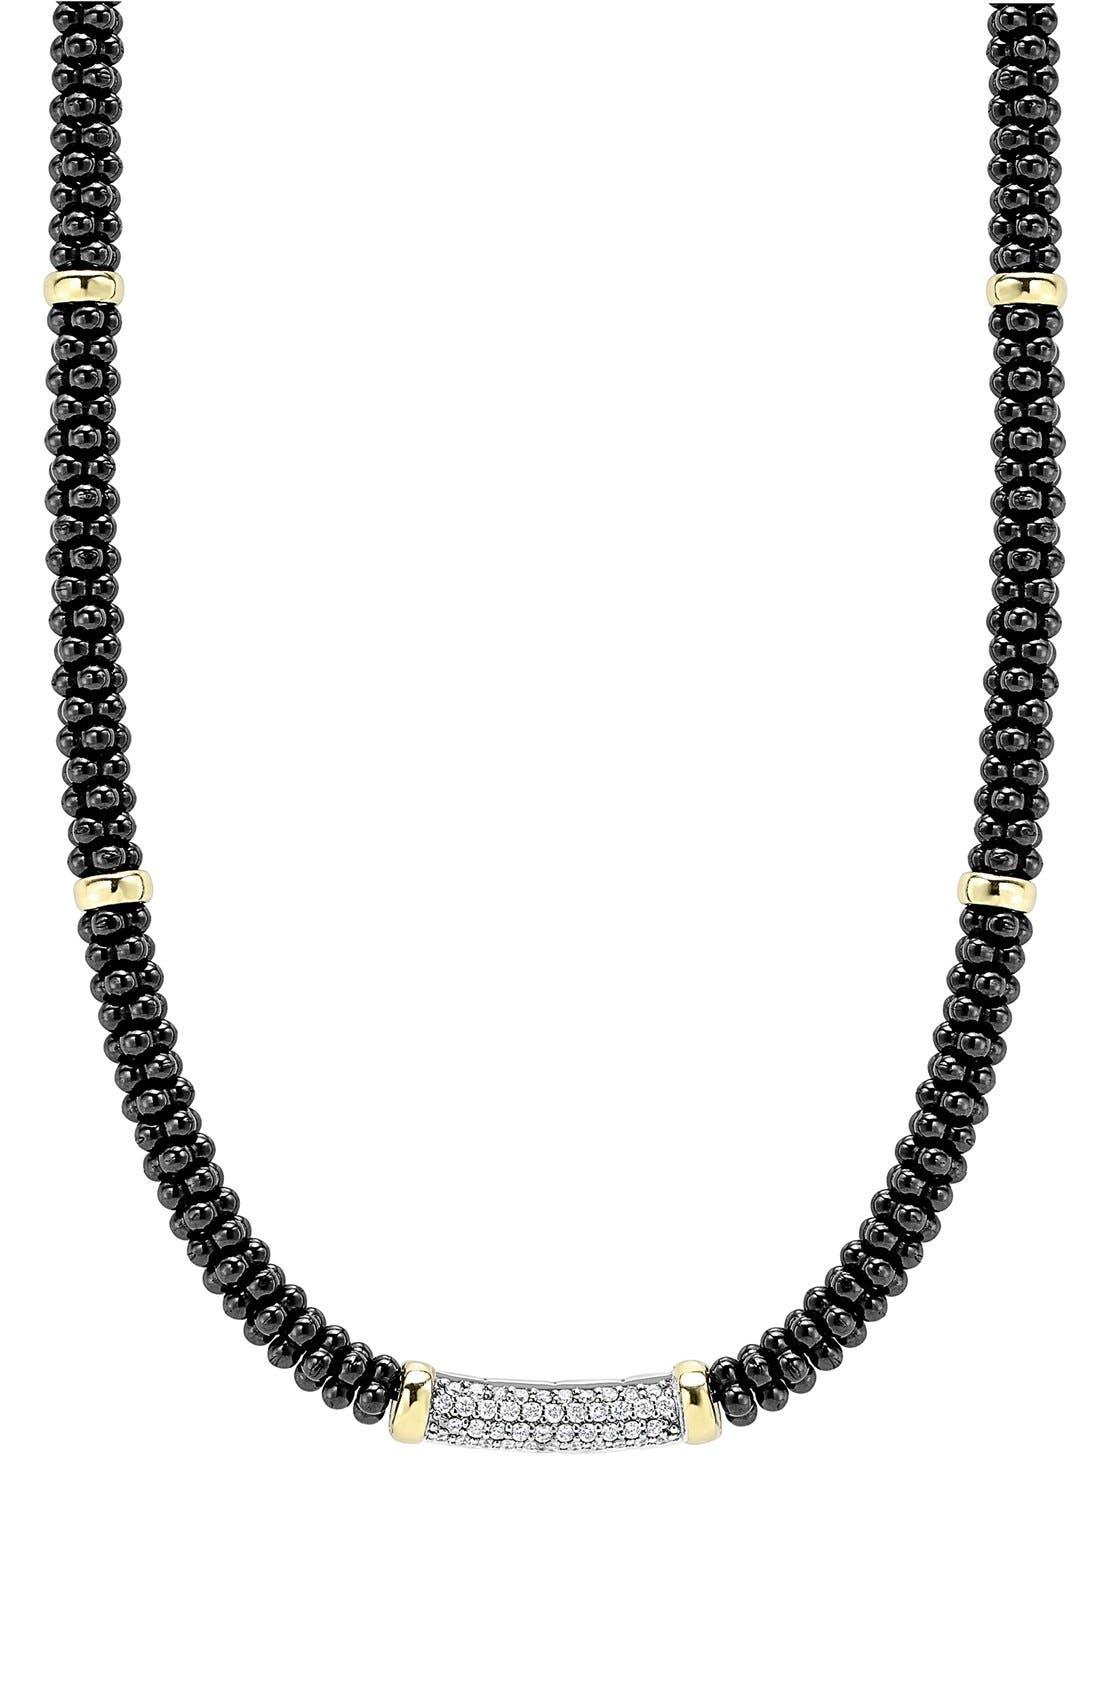 LAGOS 'Black Caviar' 5mm Beaded DiamondBar Necklace